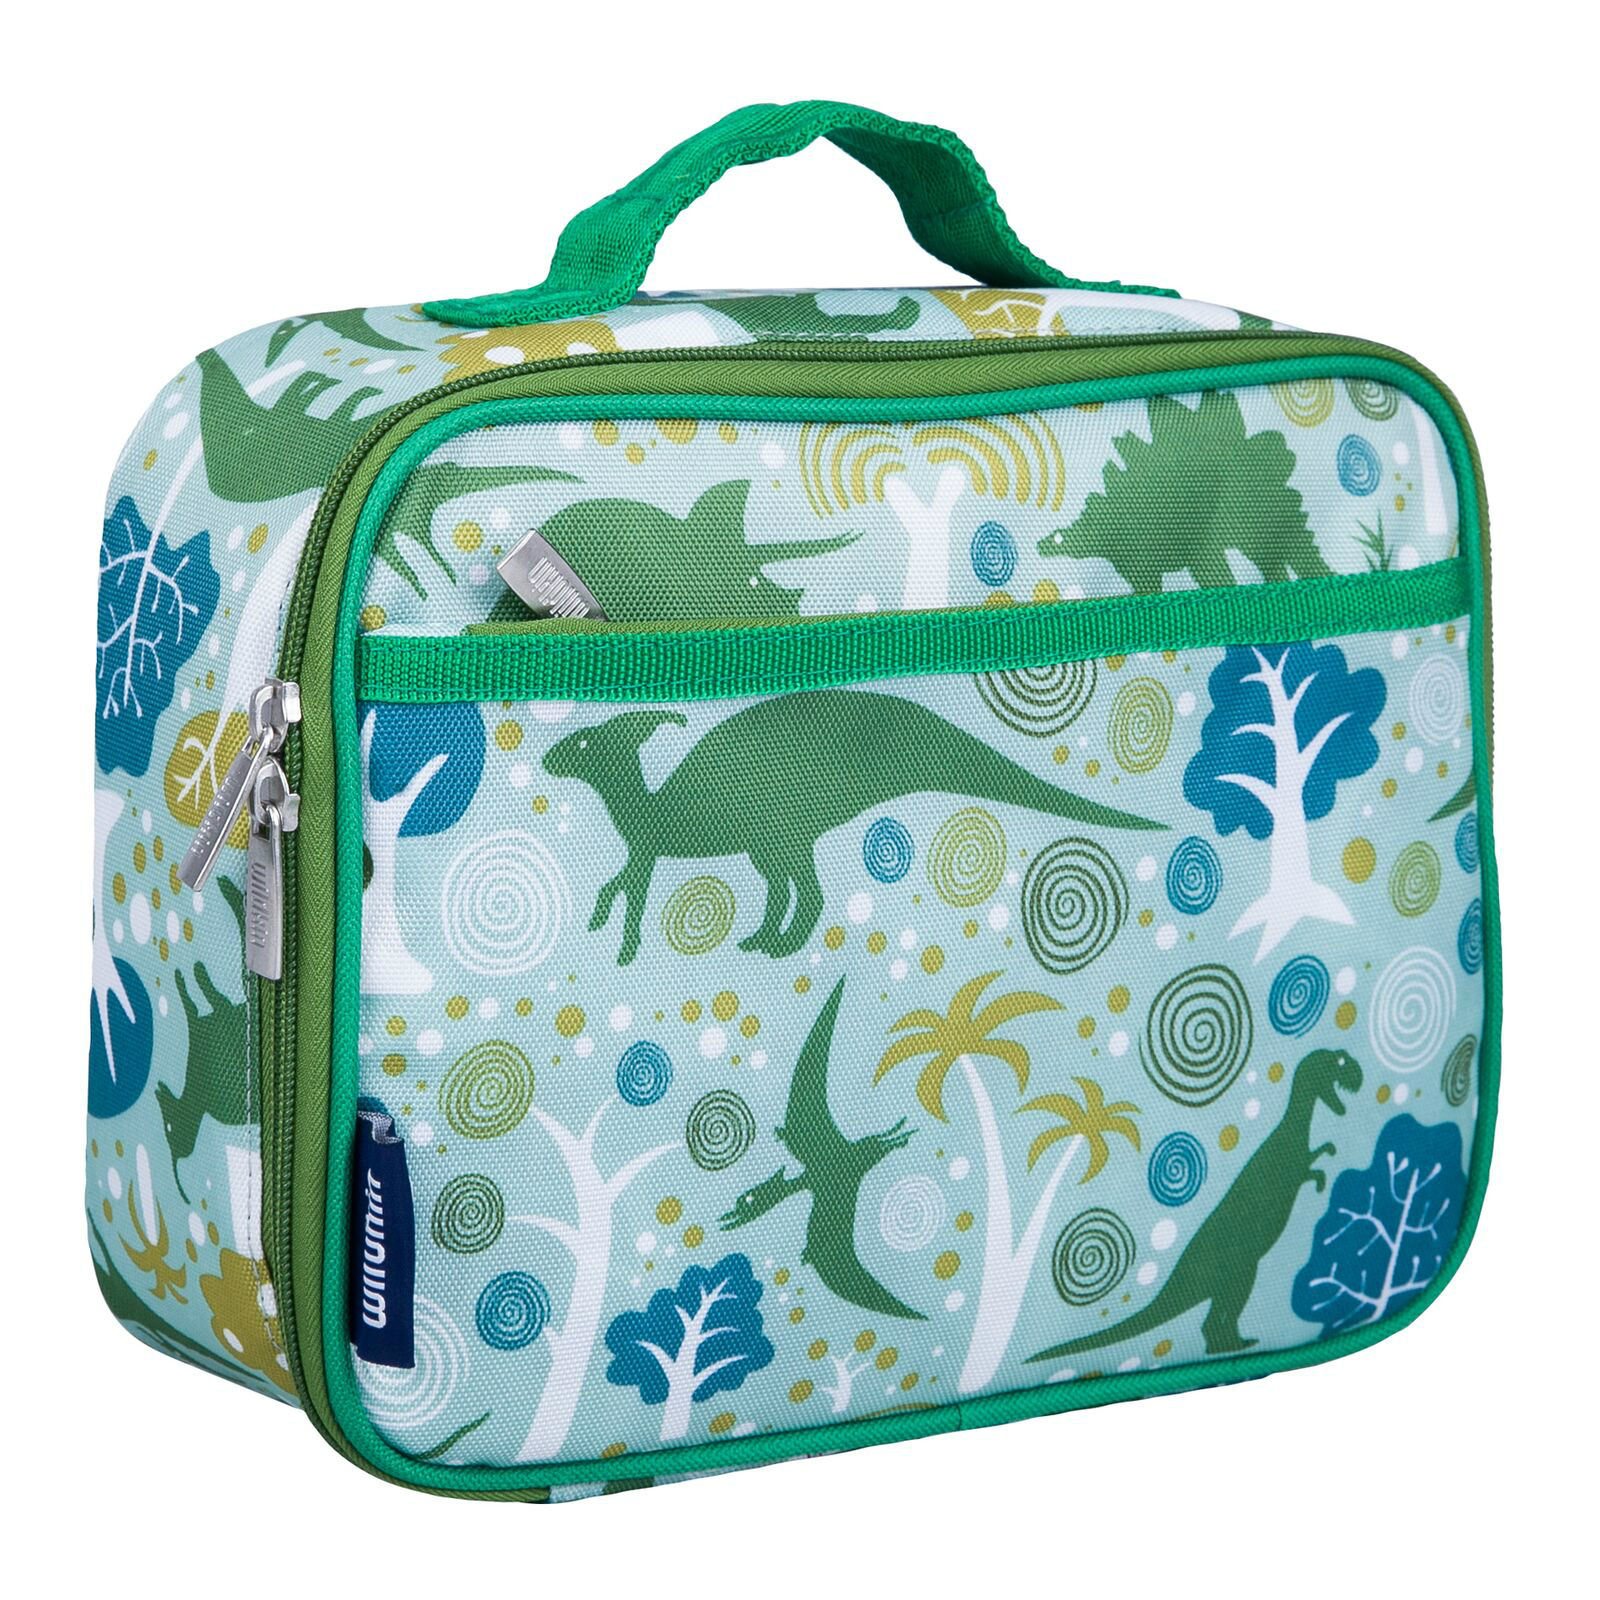 Wildkin Olive Kids Dinomite Dinosaurs Insulated Lunch Box Bag